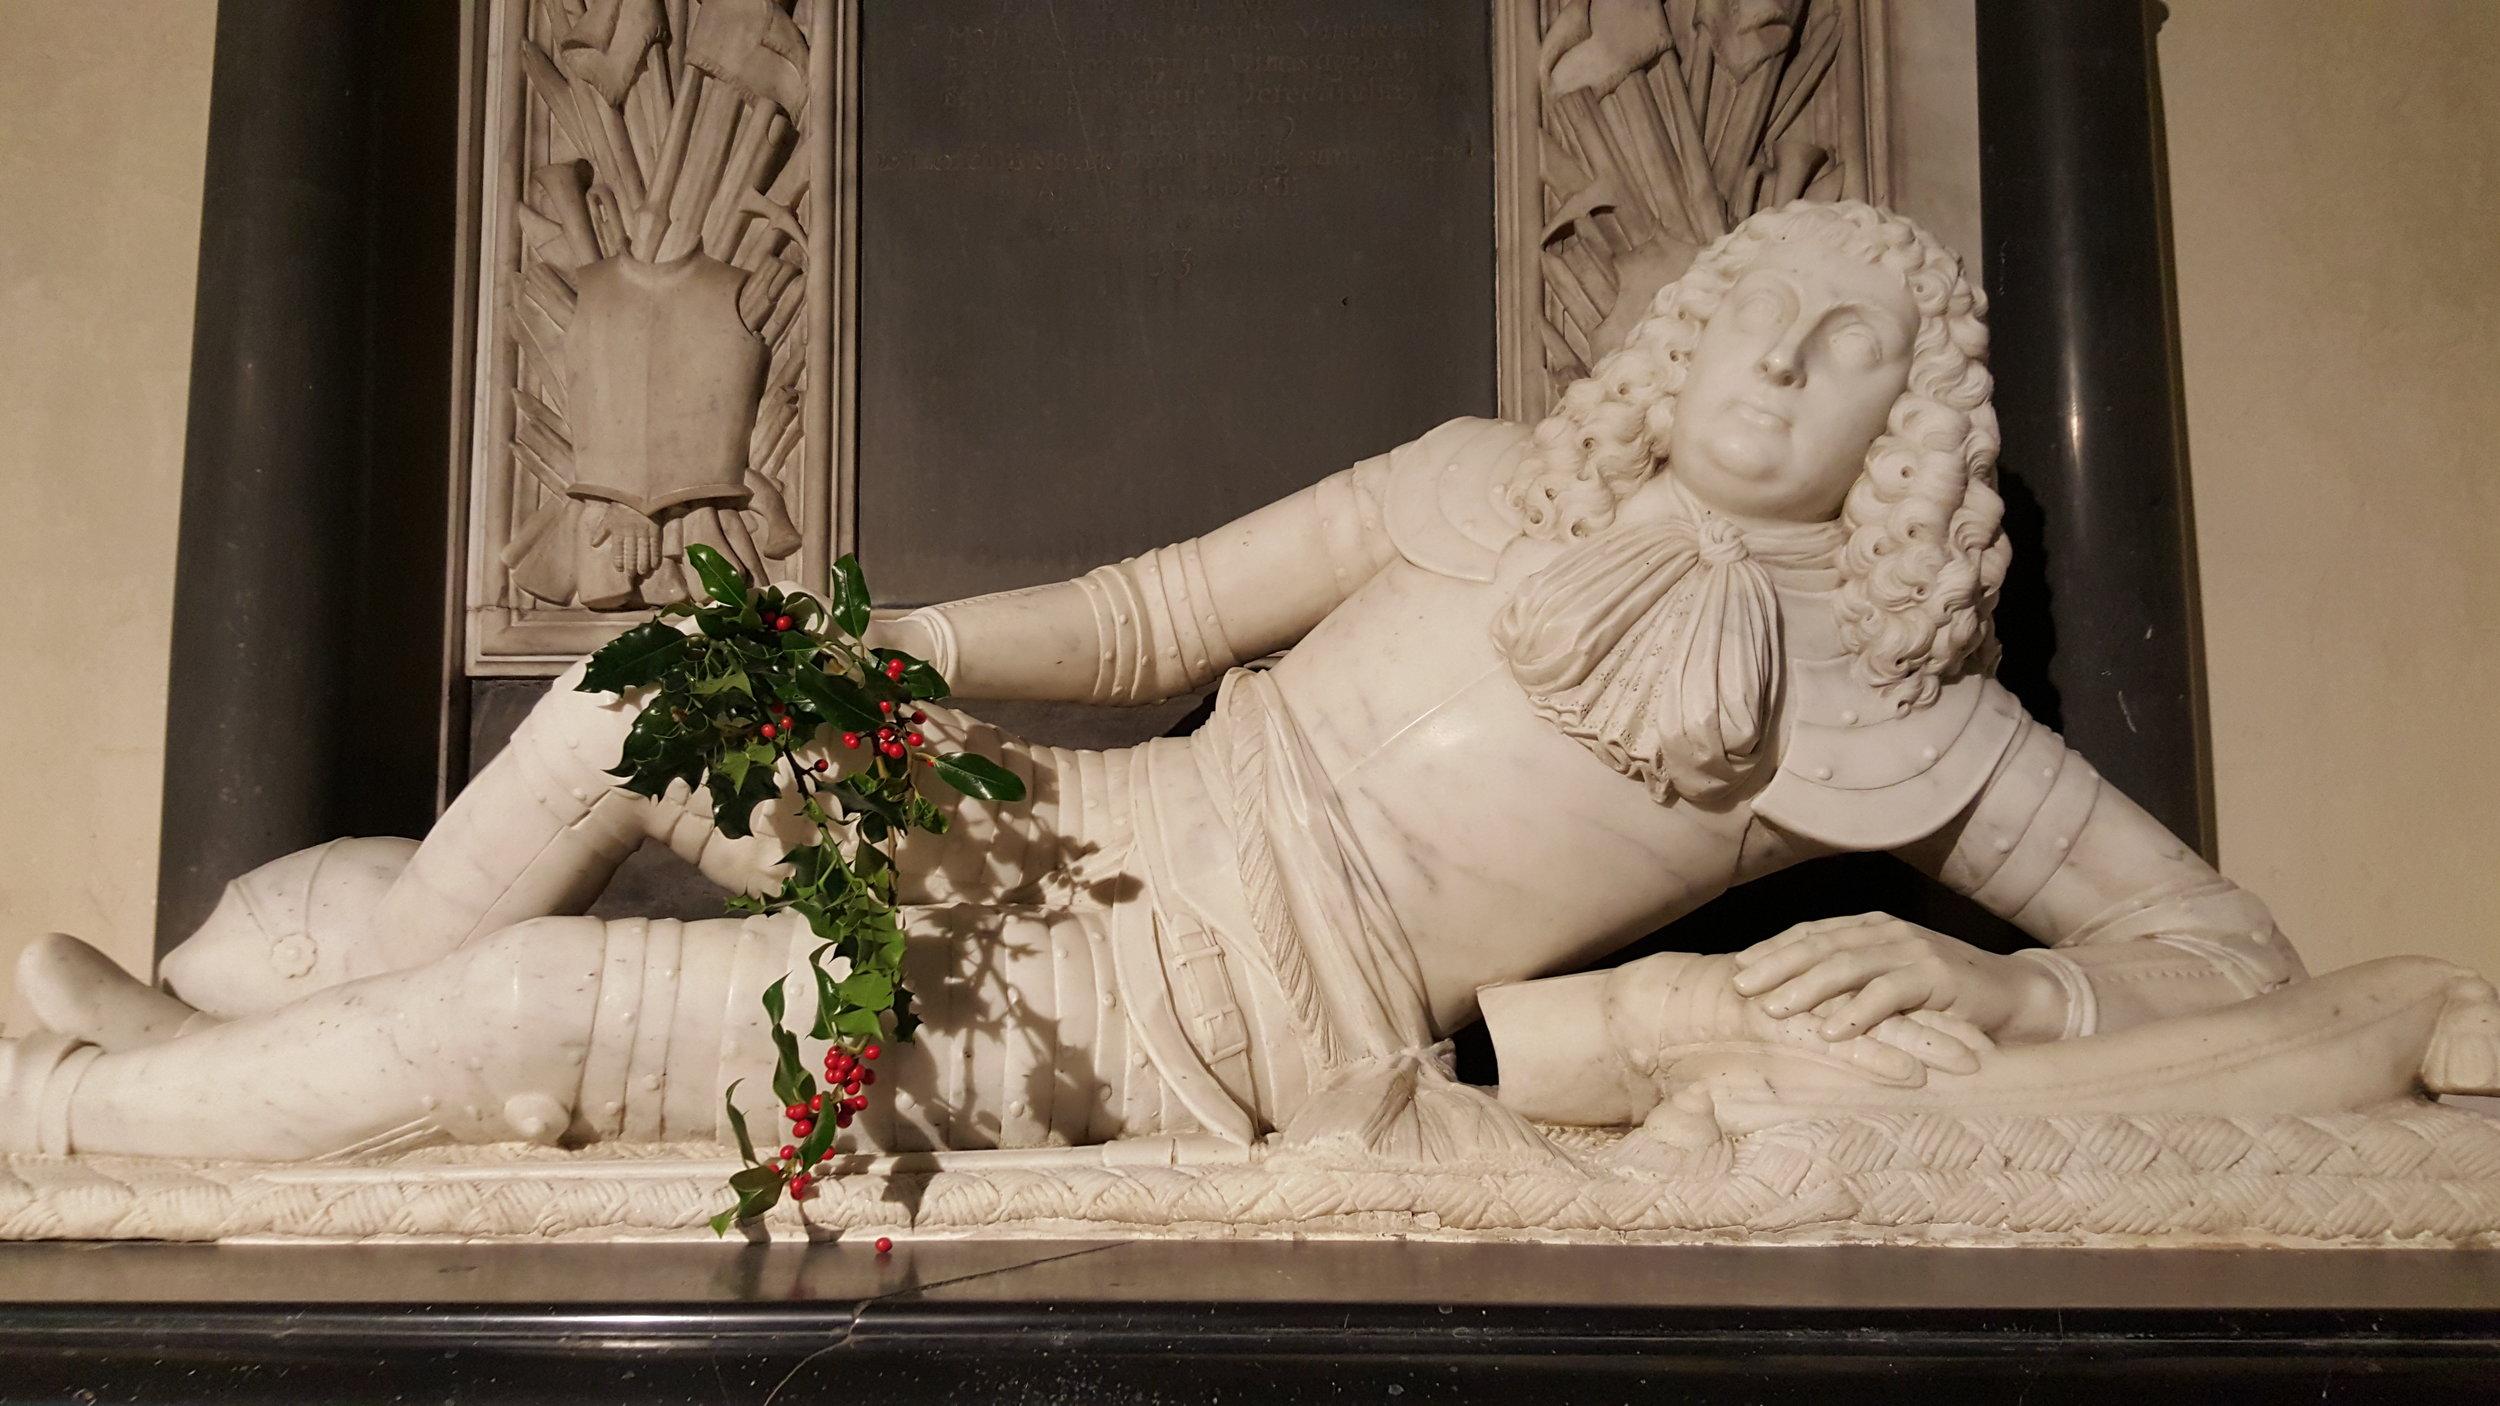 Sir Richard, after a visit from Rita!